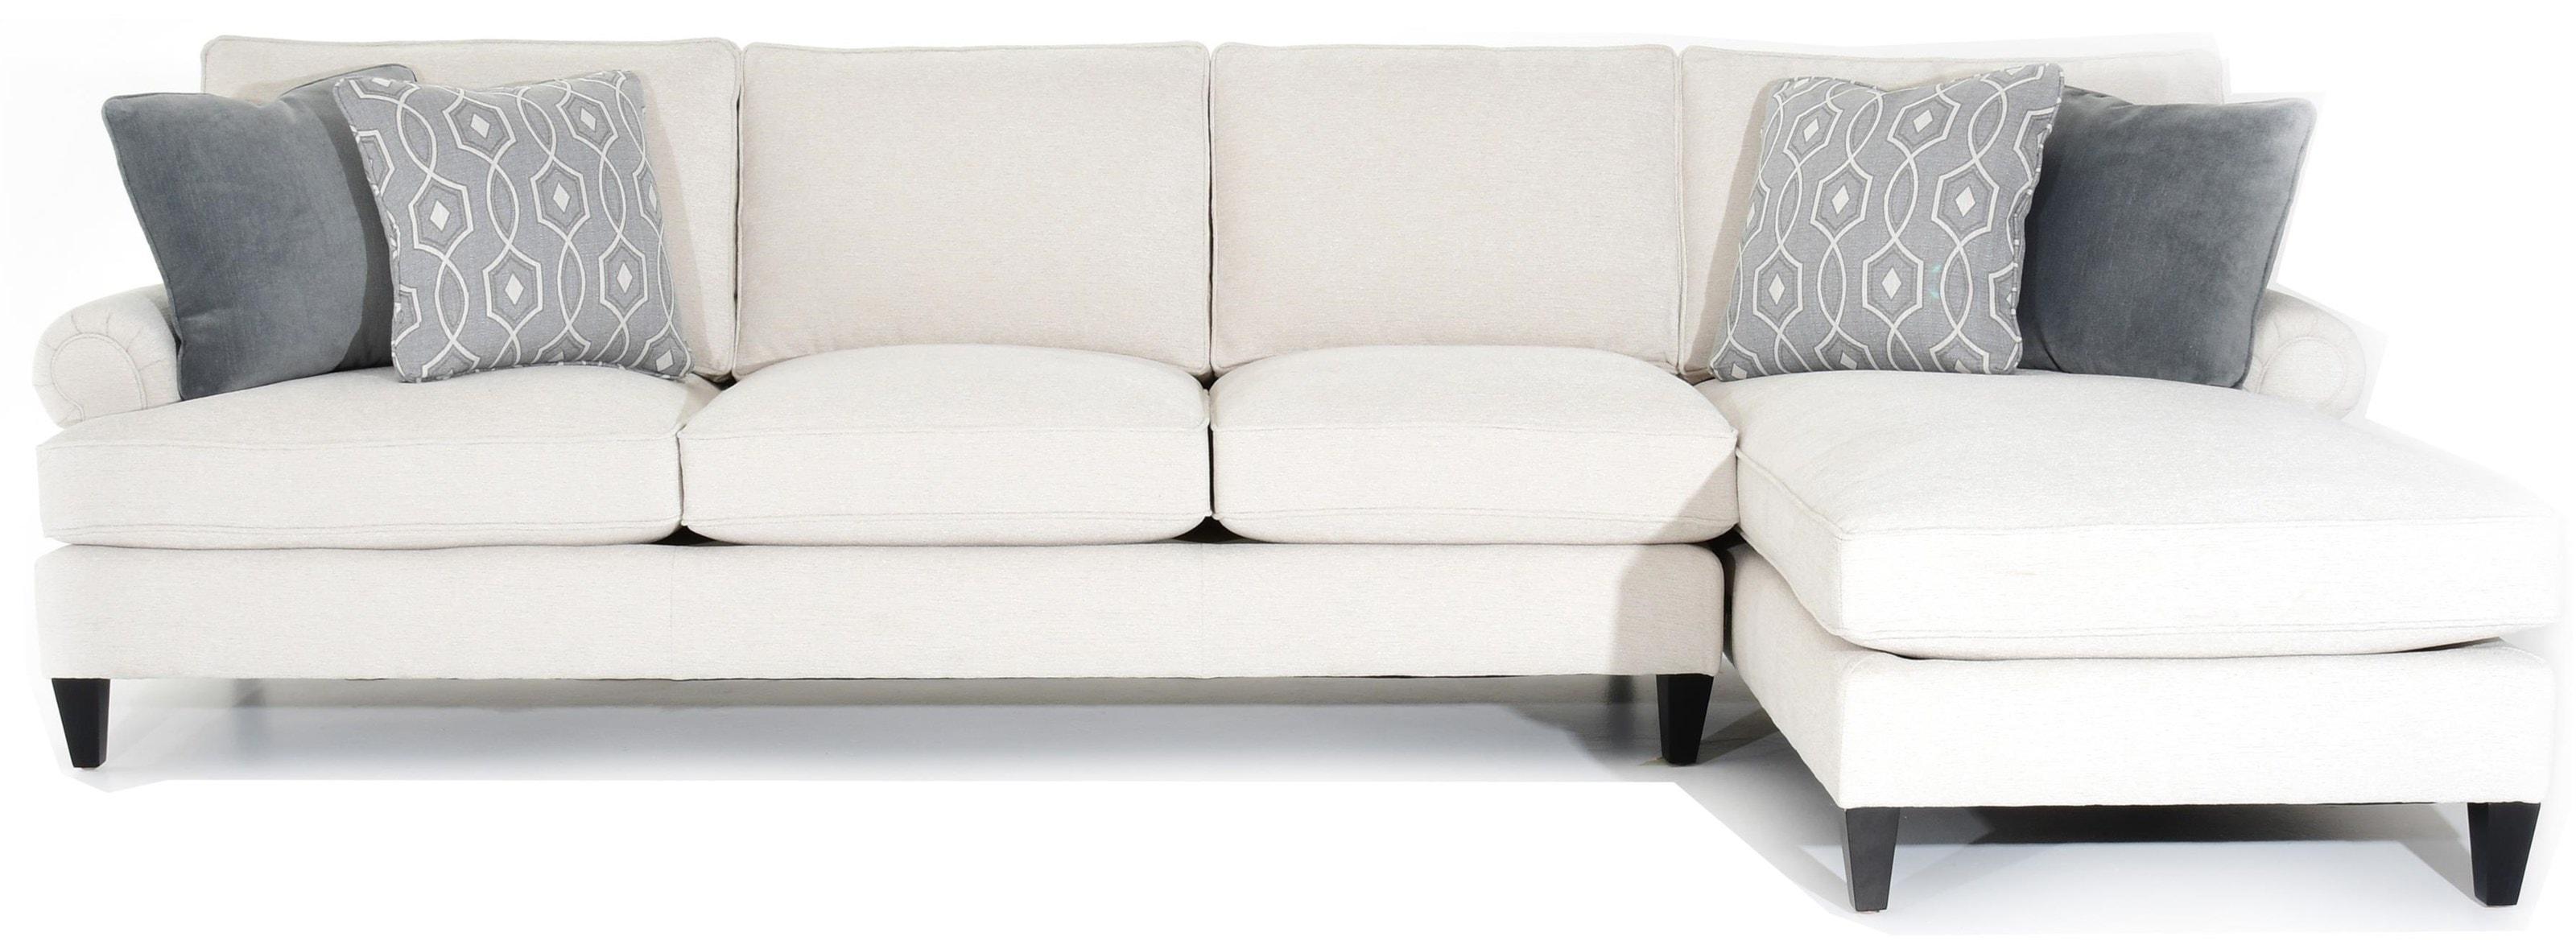 bernhardt living room furniture. bernhardt signature seatingcustomizable sofa with chaise living room furniture